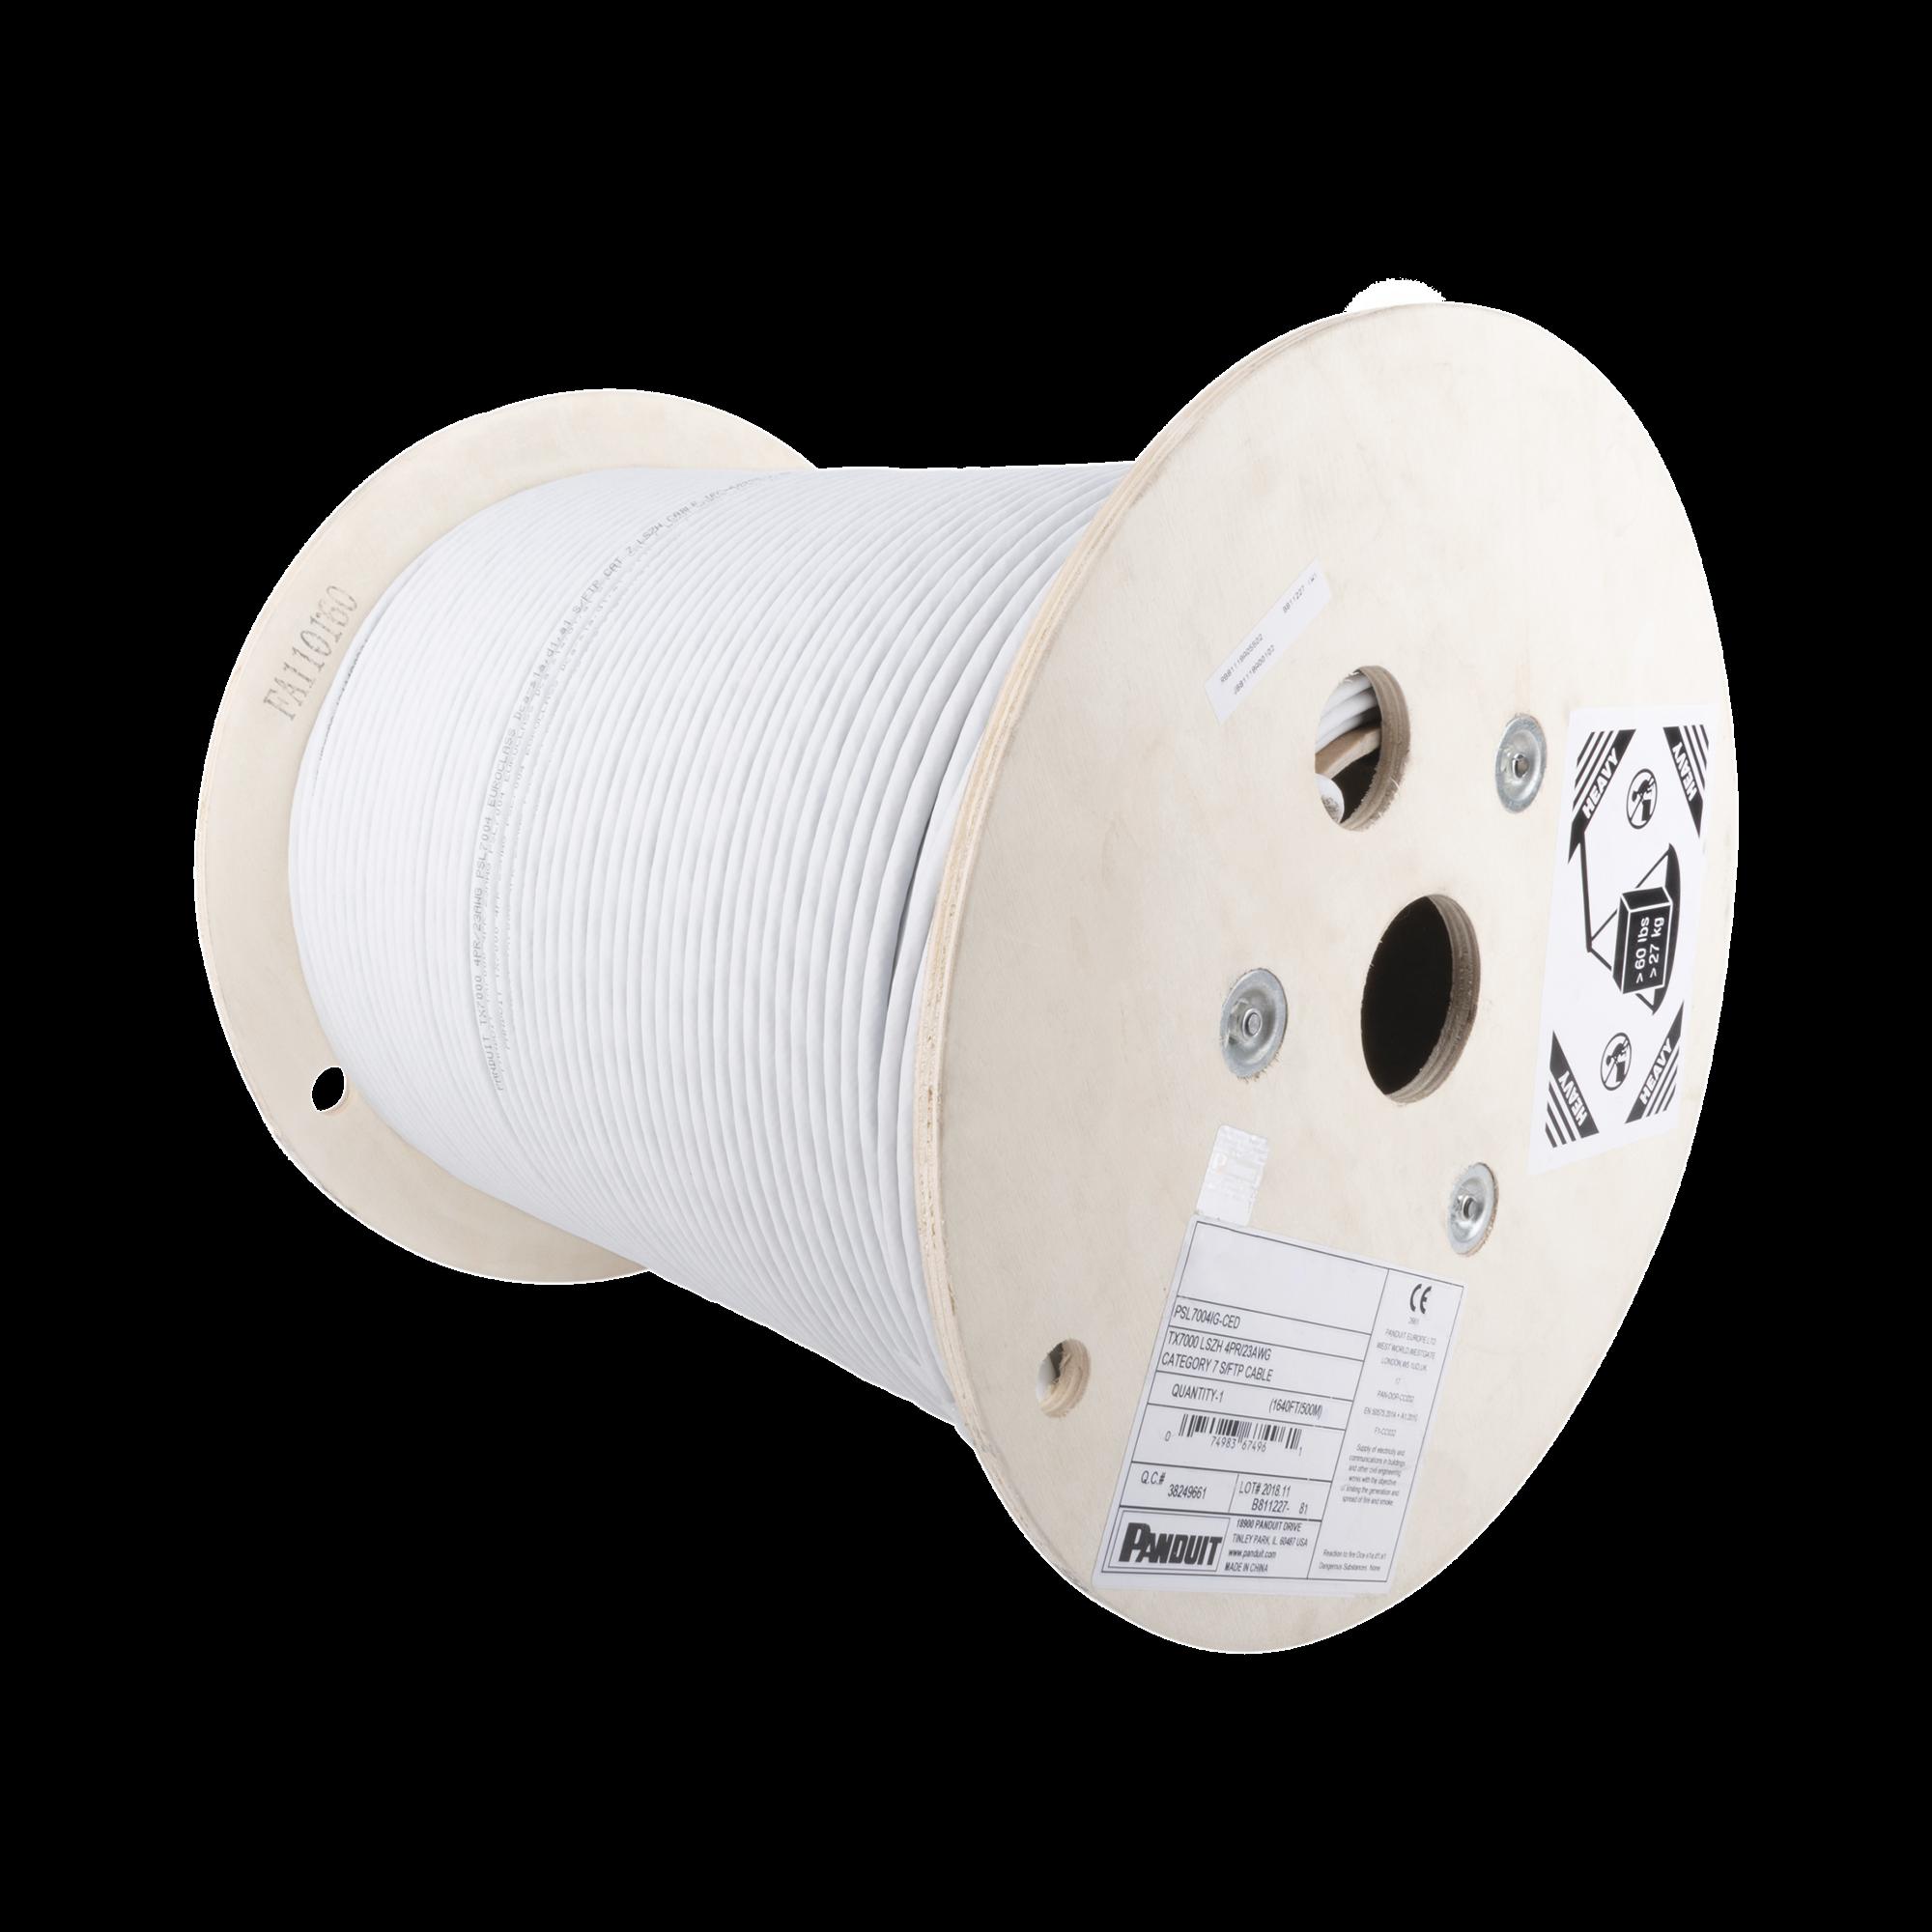 Bobina de Cable Blindado S/FTP de 4 pares, Cat7, Inmune a Ruido e Interferencias, LSZH (Bajo humo, Cero Halógenos), Color Gris, Bobina de 500 m